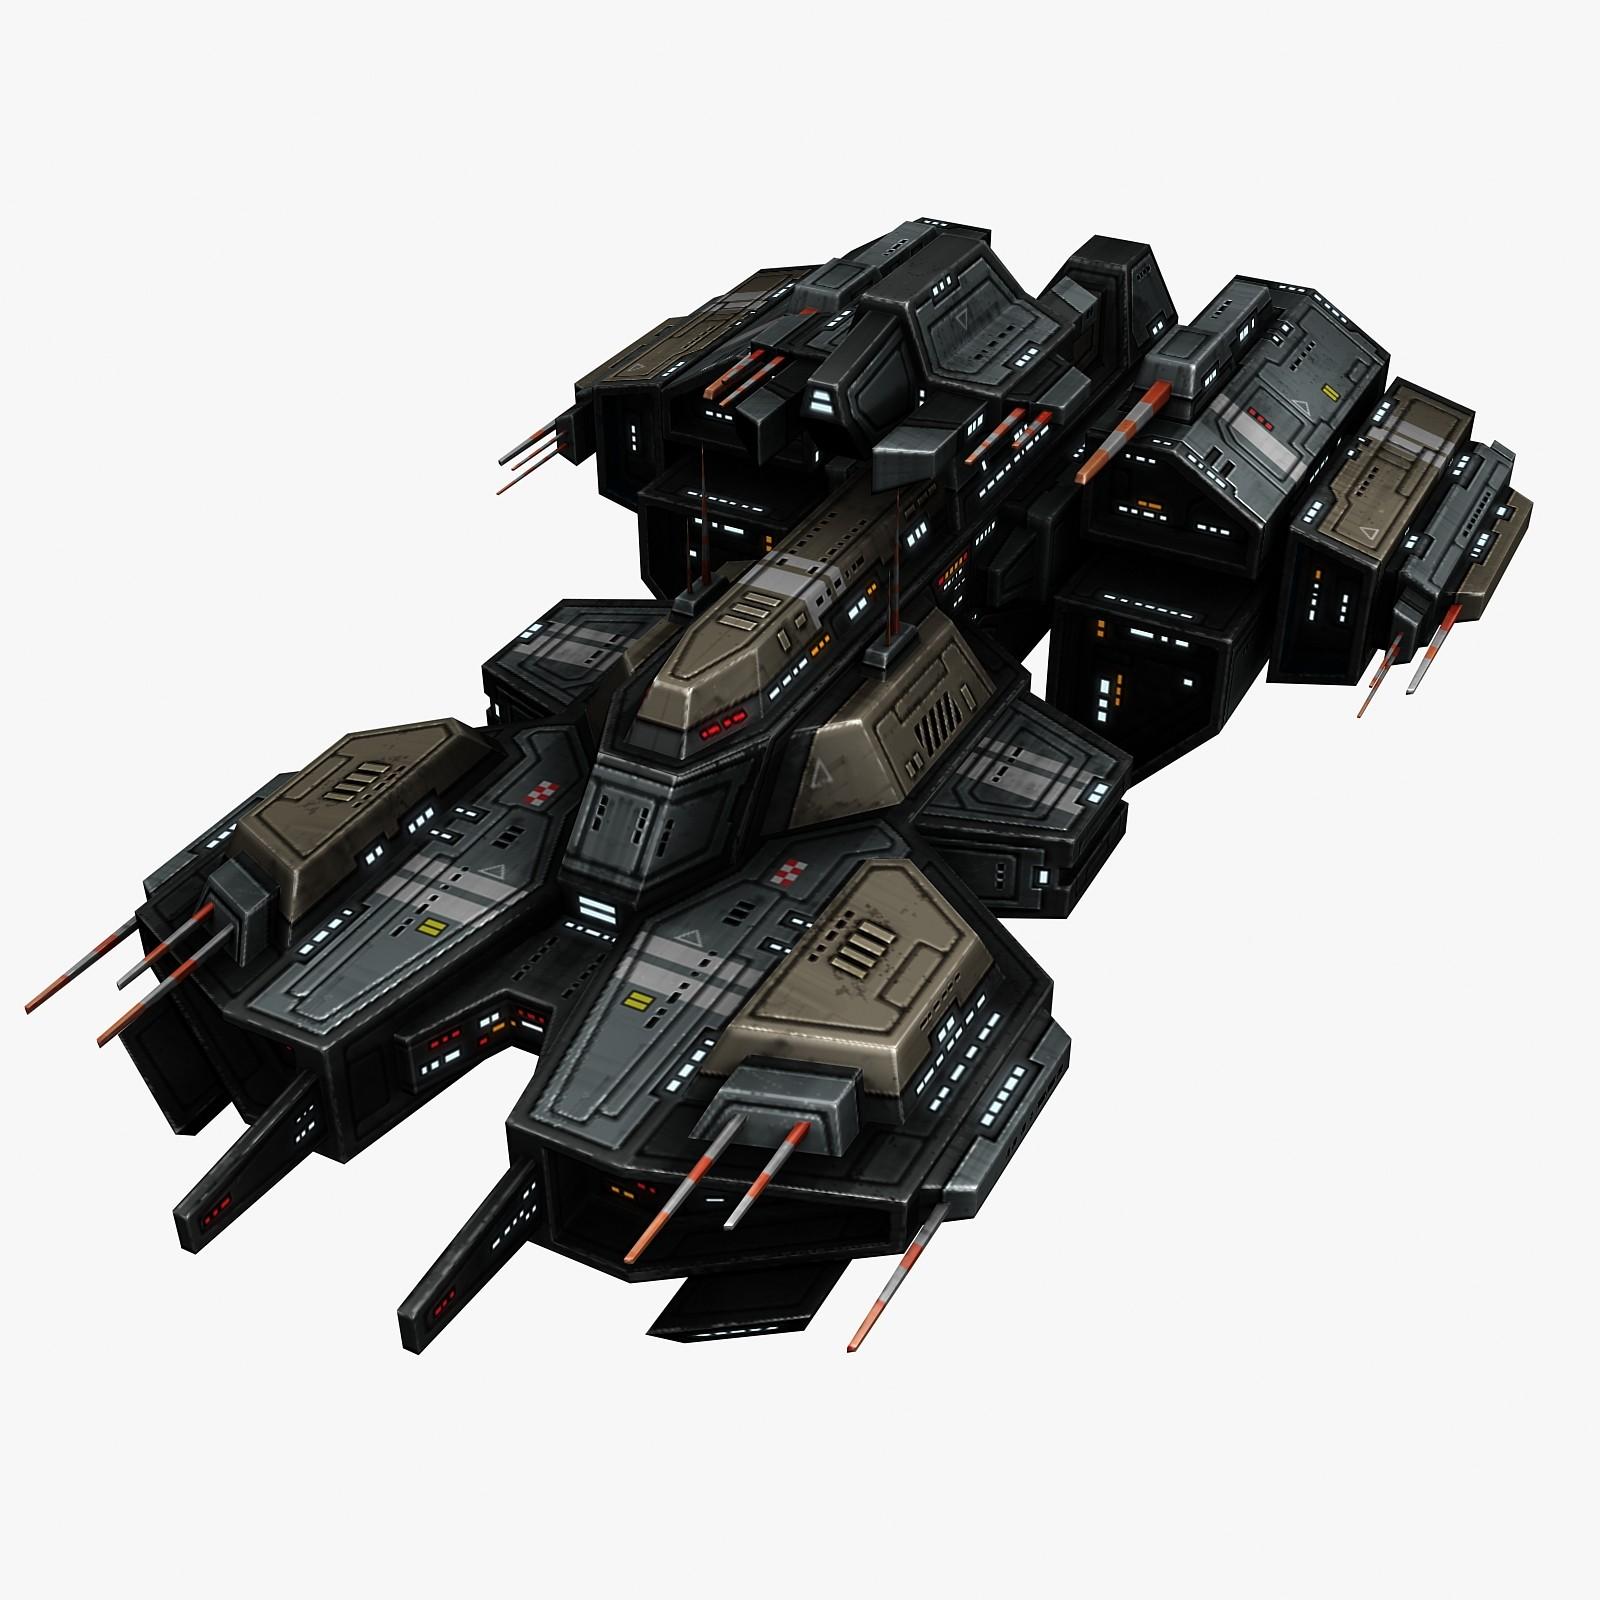 spaceship_frigate_2_preview_1.jpg